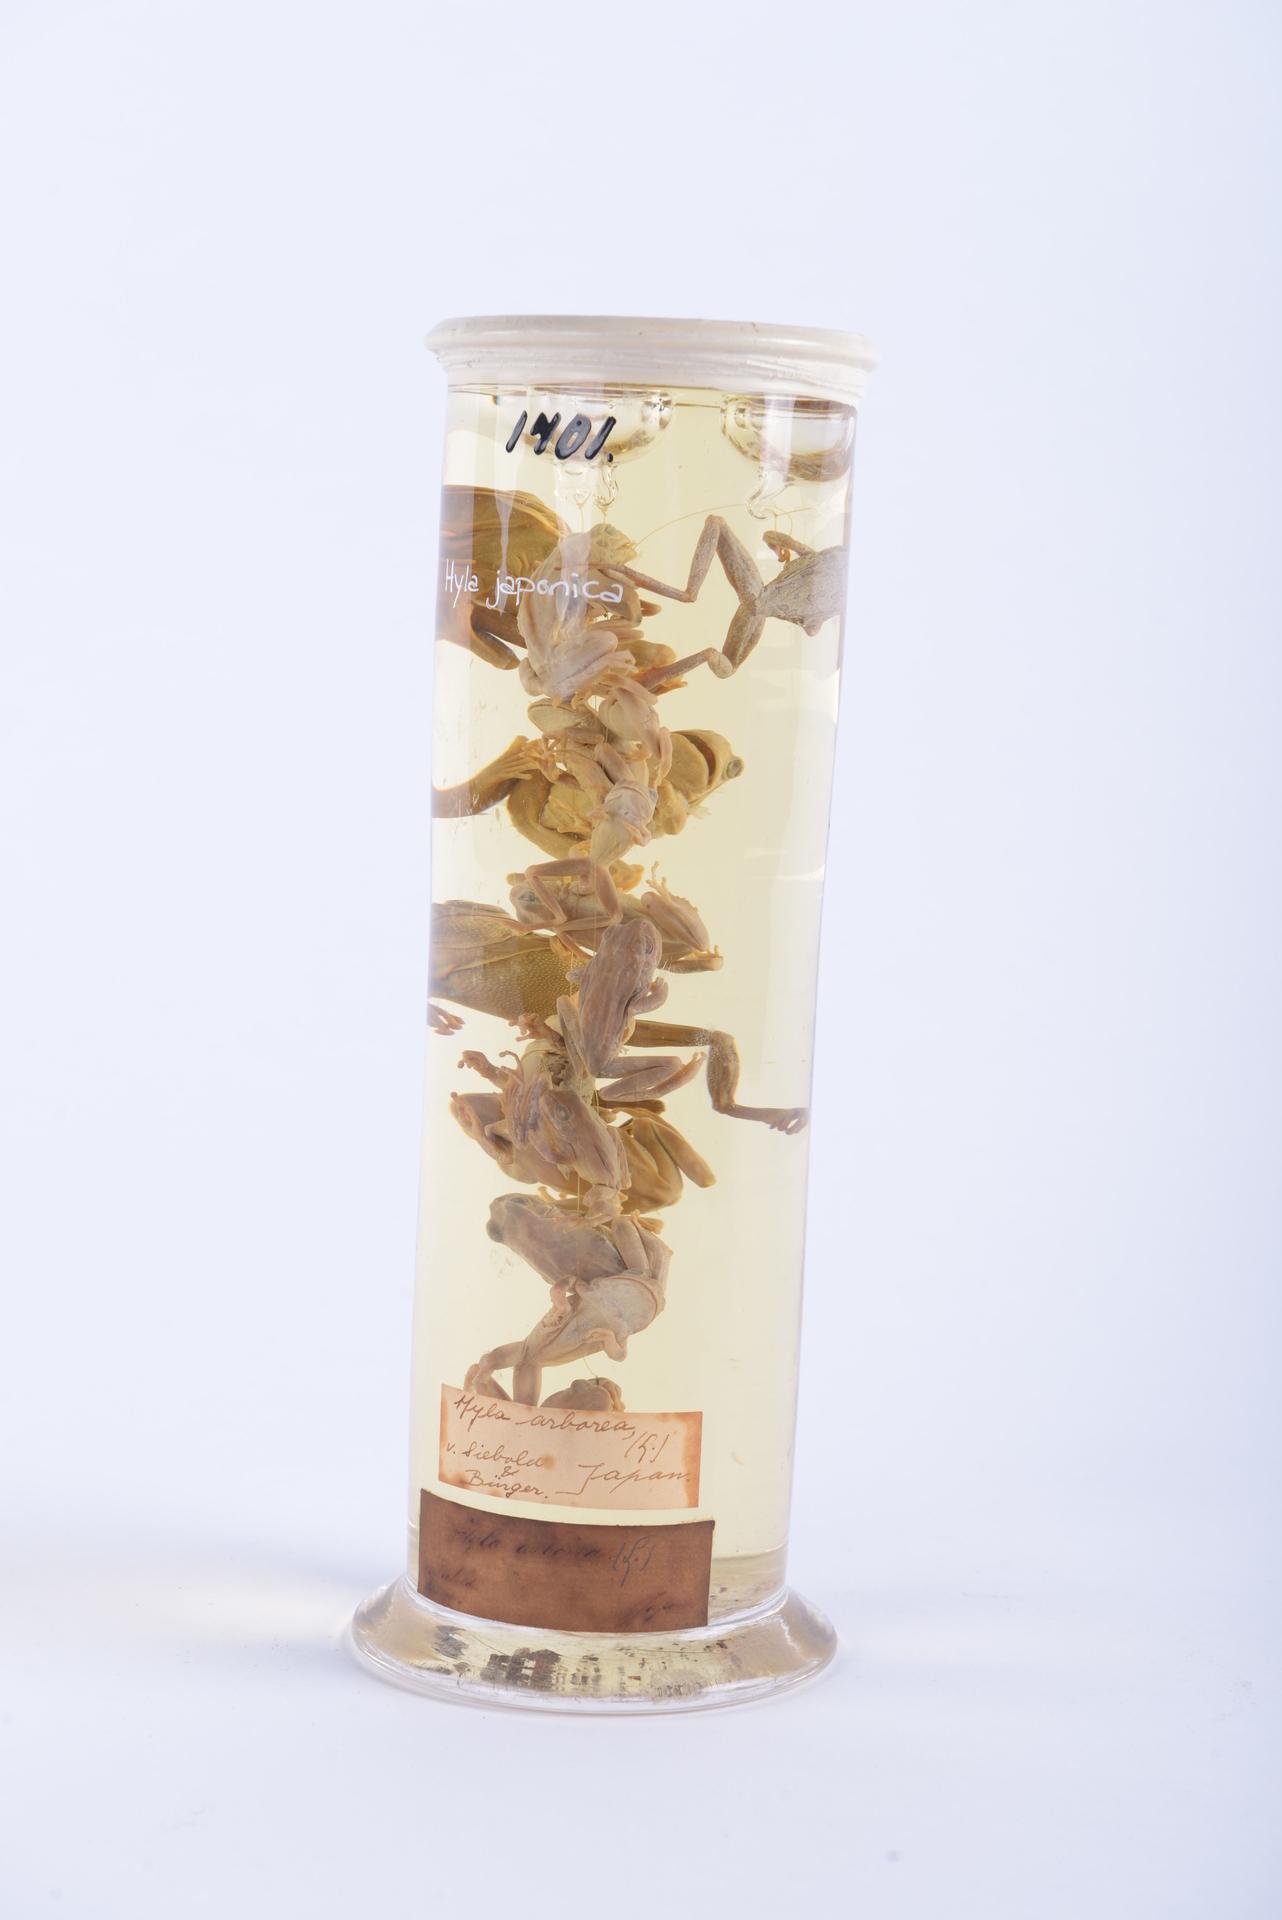 RMNH.RENA.1701 | Hyla japonica Günther, 1859